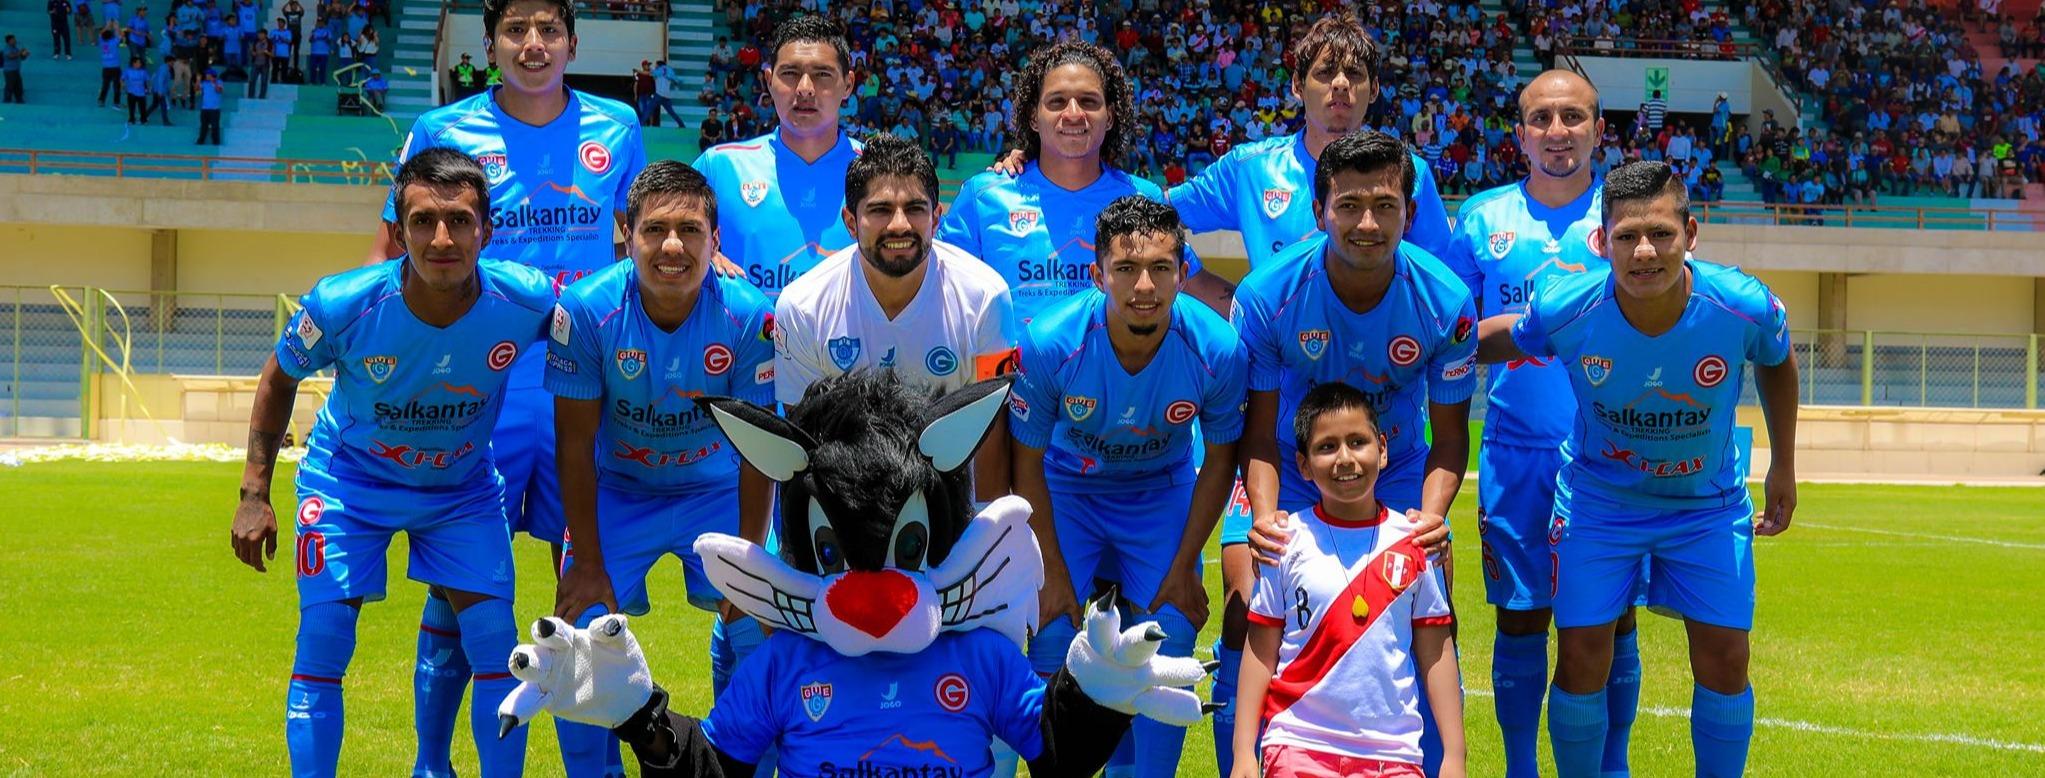 Portada CLUB Deportivo Garcilaso